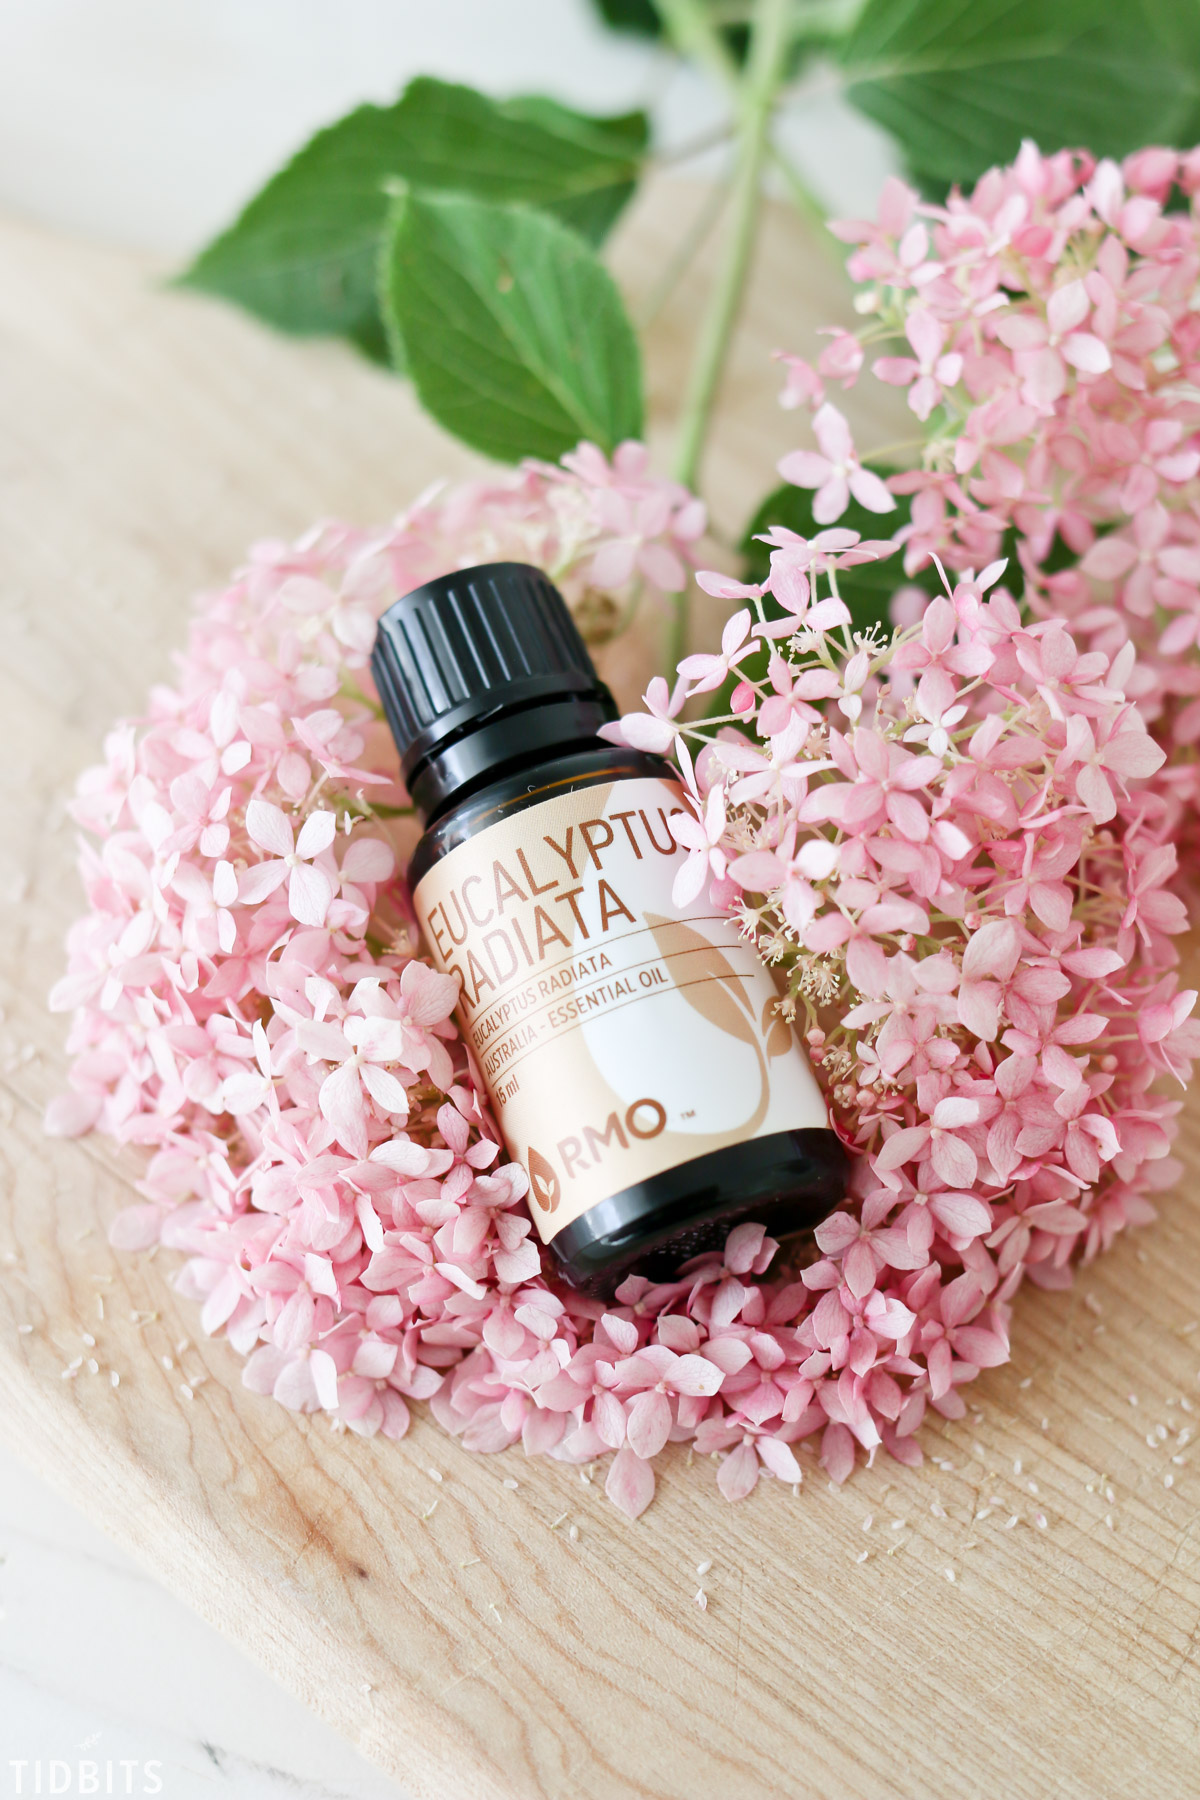 eucalyptus essential oil in flowers